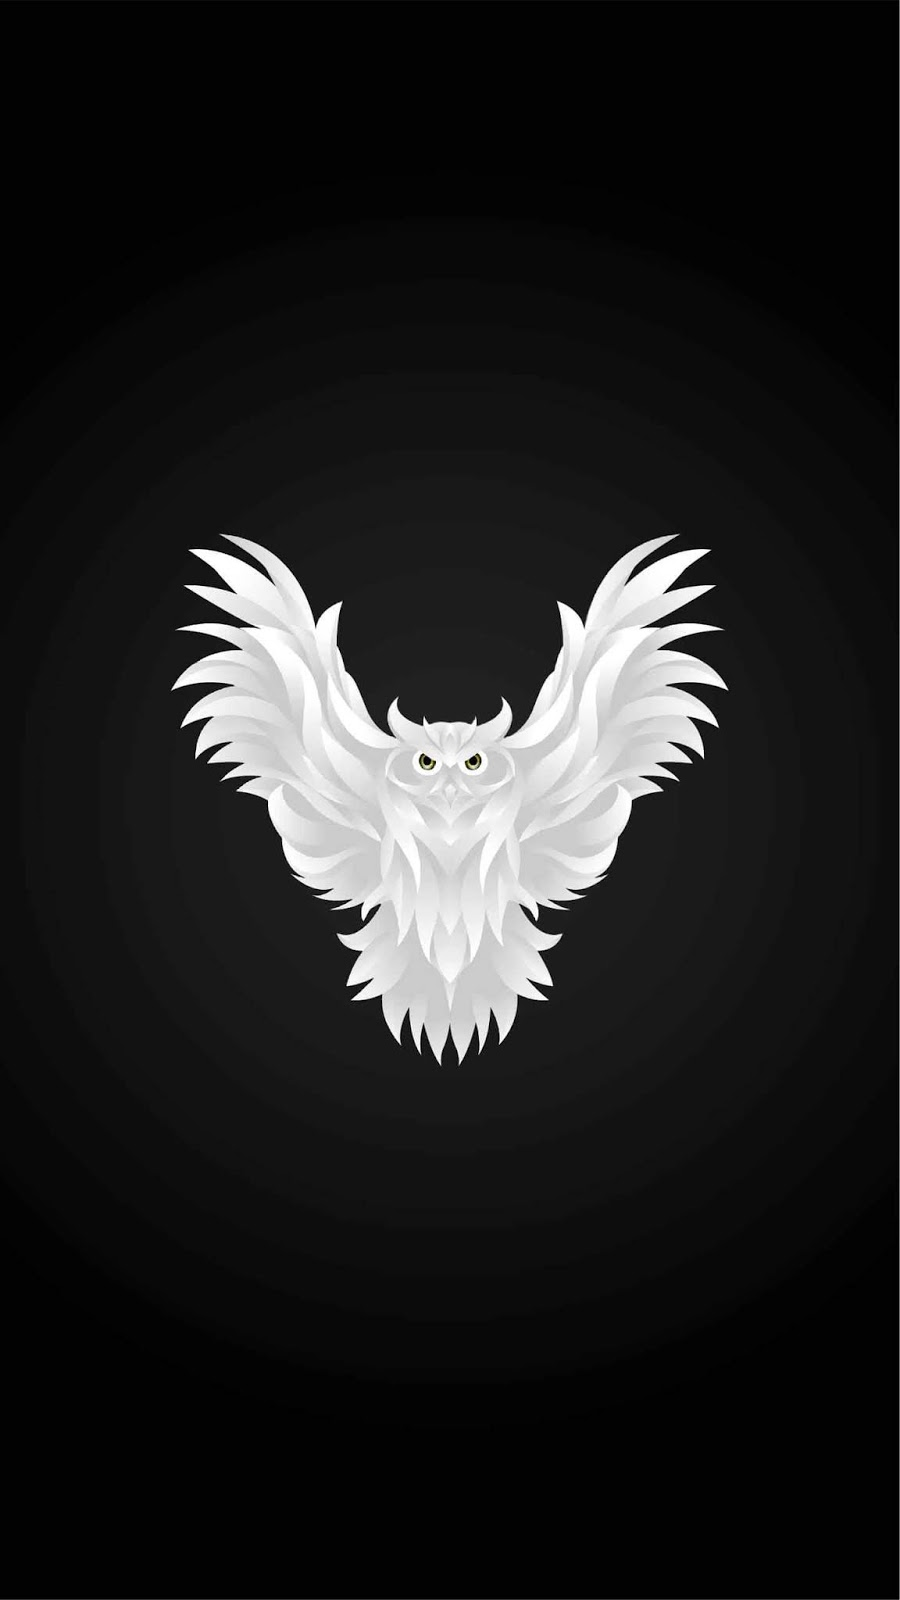 Dark Owl Wallpaper Artistic Joyful